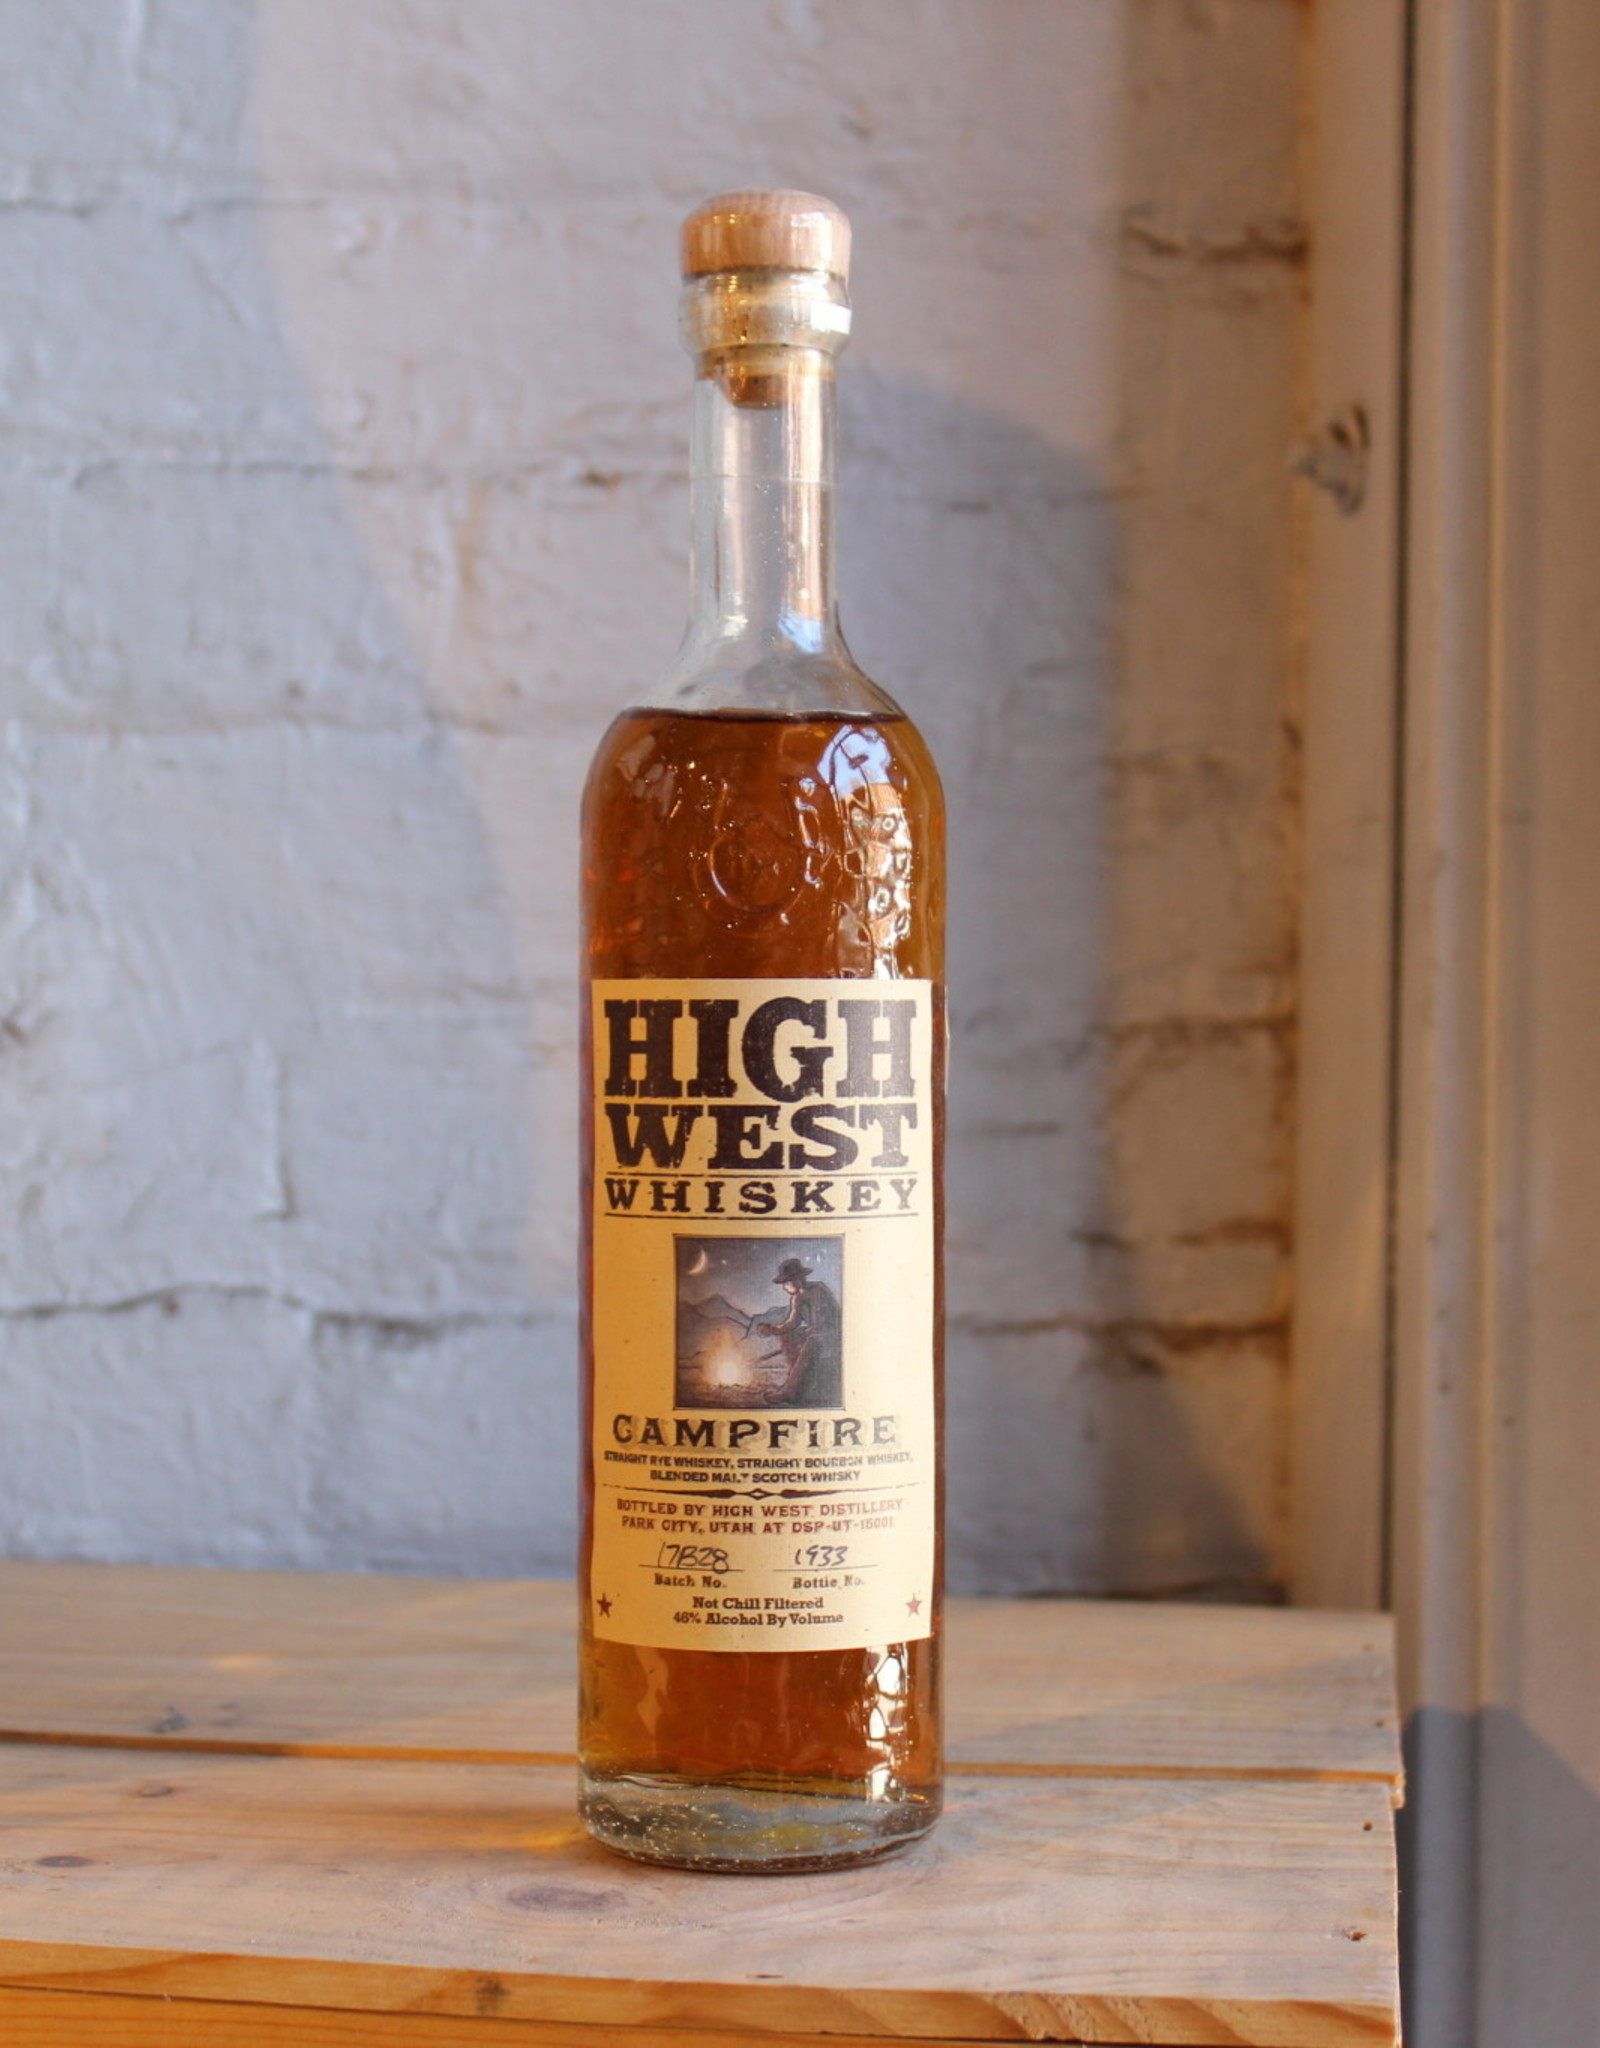 High West Campfire Whiskey - Park City, Utah (375ml)